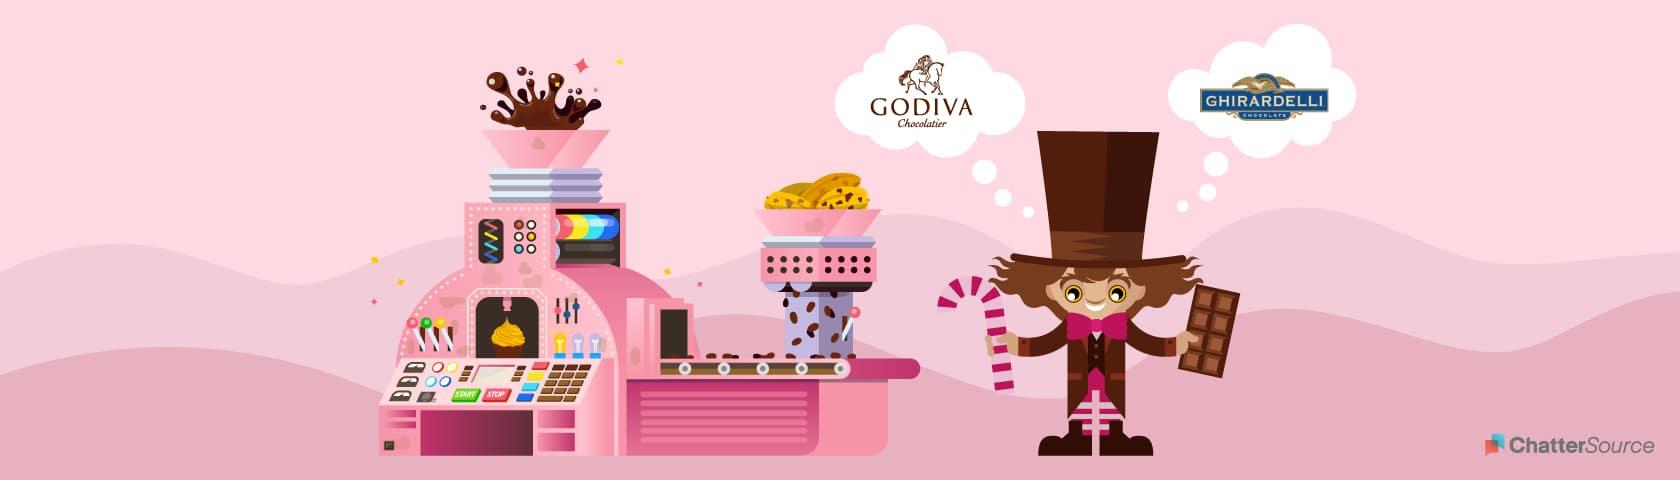 Godiva vs Ghirardelli graphic